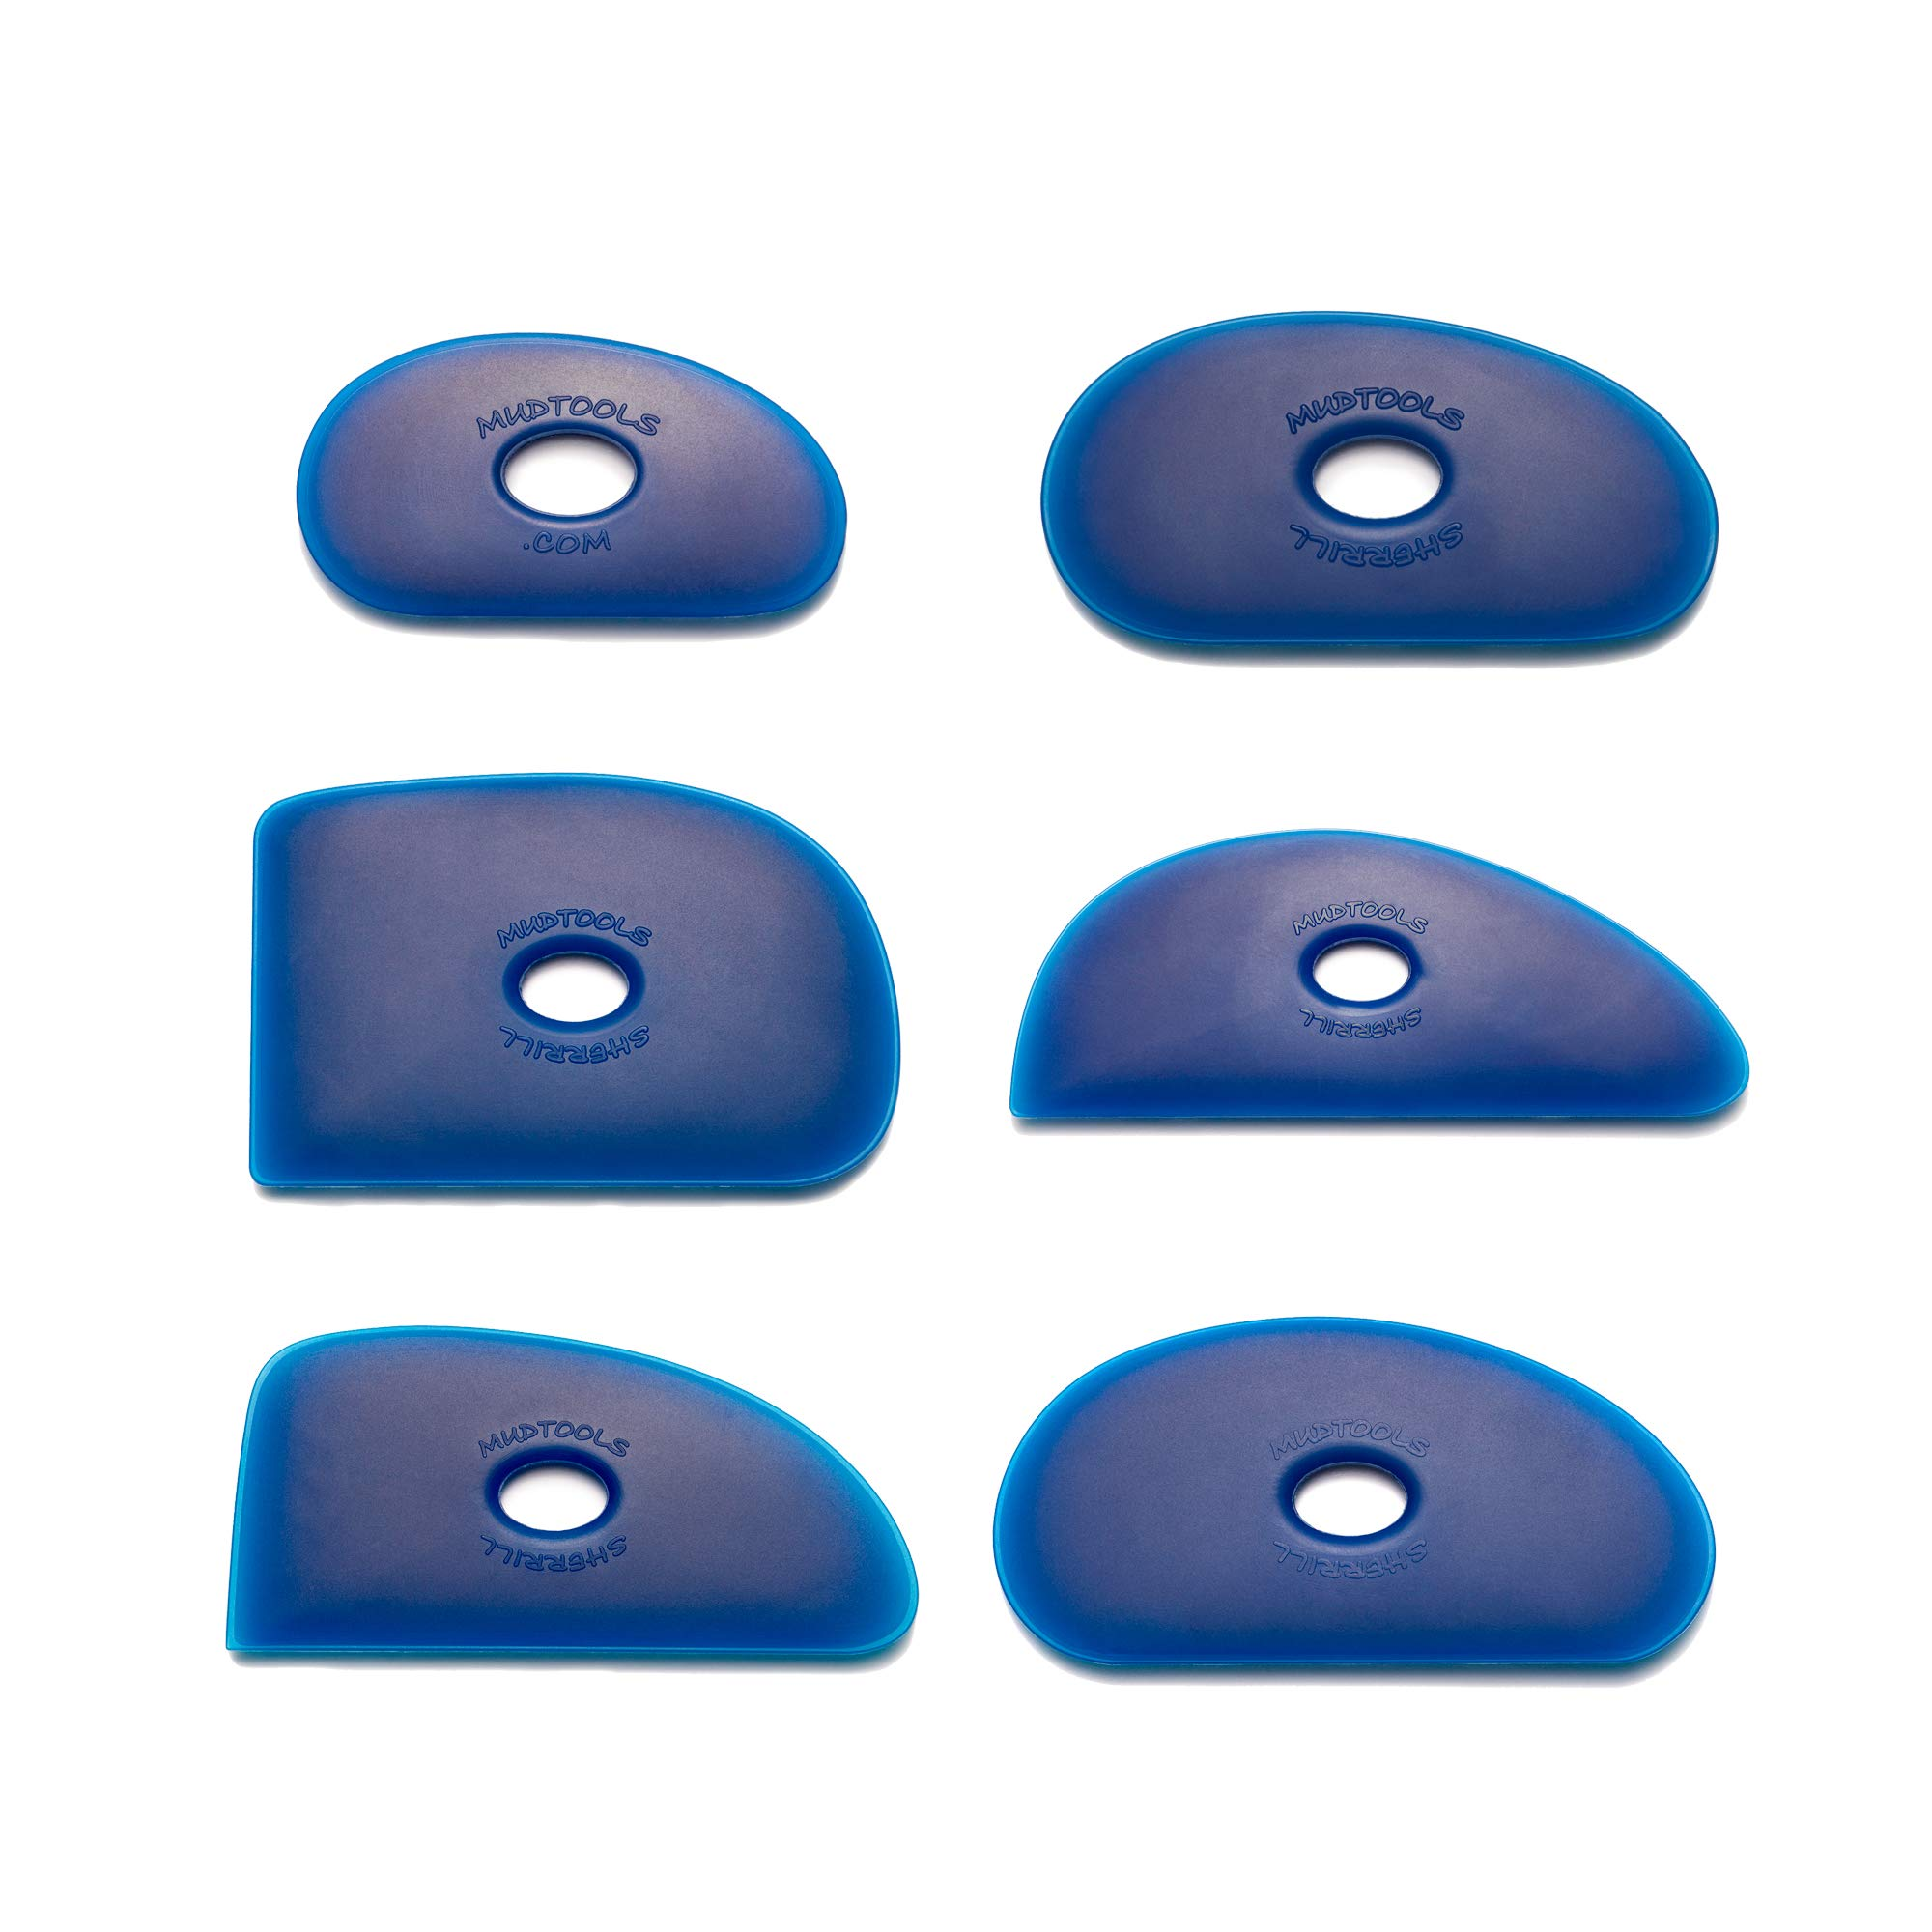 Mudtools Polymer Rib Blue Firm - All 6 Shapes - Ceramics, Pottery, Clay - BA